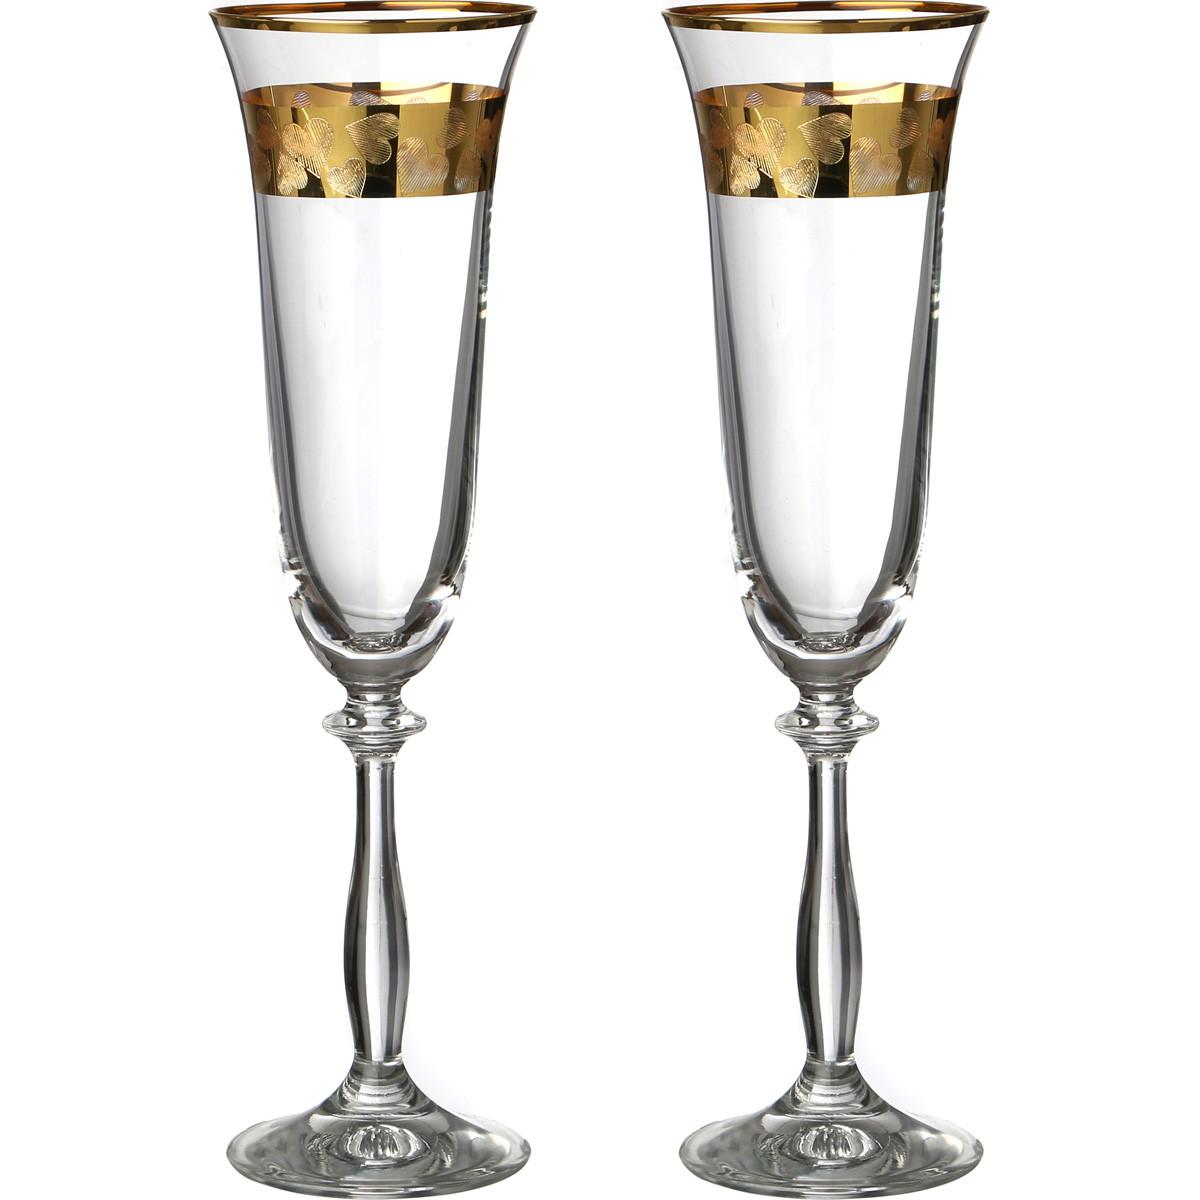 {} Bohemia Crystal Набор бокалов для шампанского Allister  (25 см - 2 шт) crystal bohemia